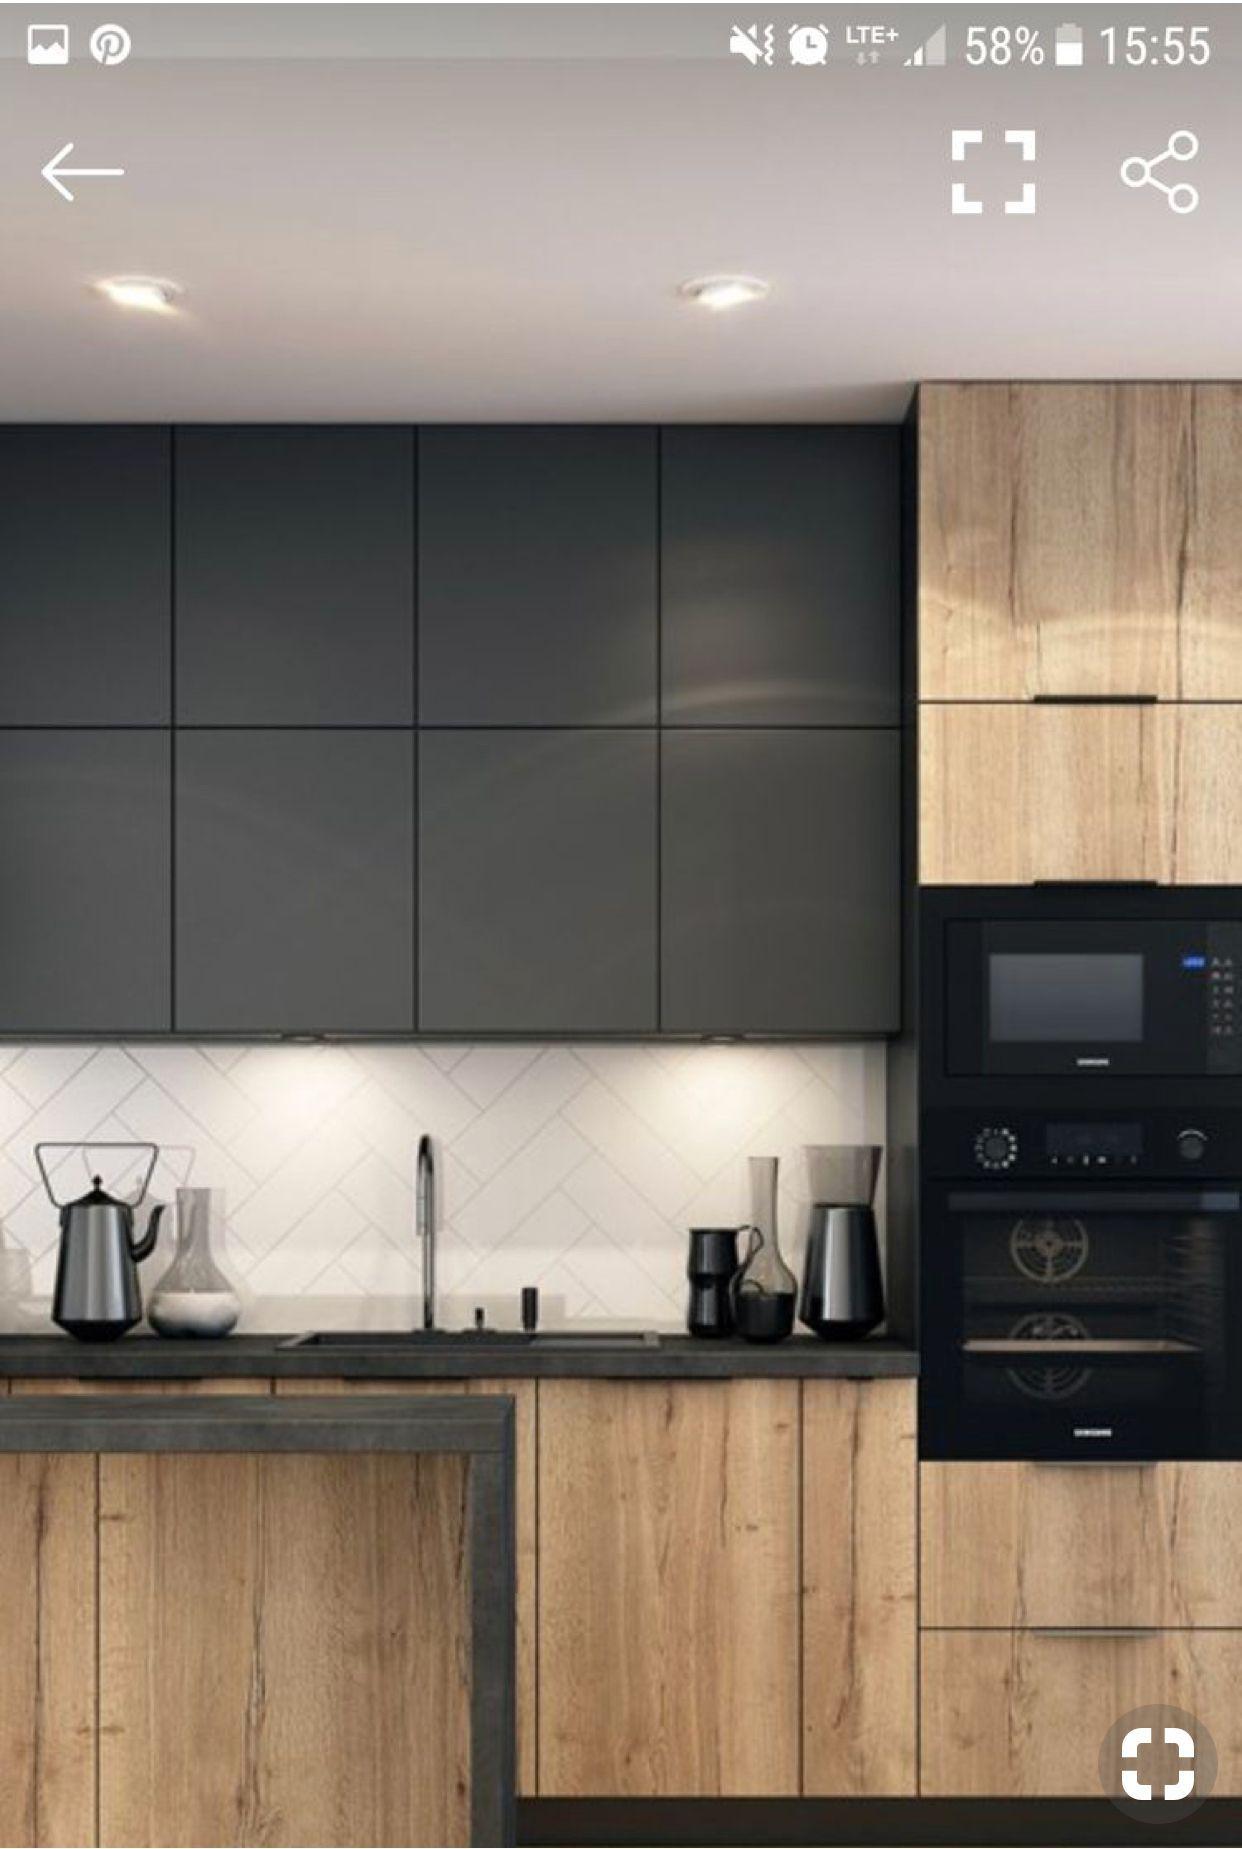 12+ Striking 80s Kitchen Remodel Benjamin Moore Ideas #kitchenremodel